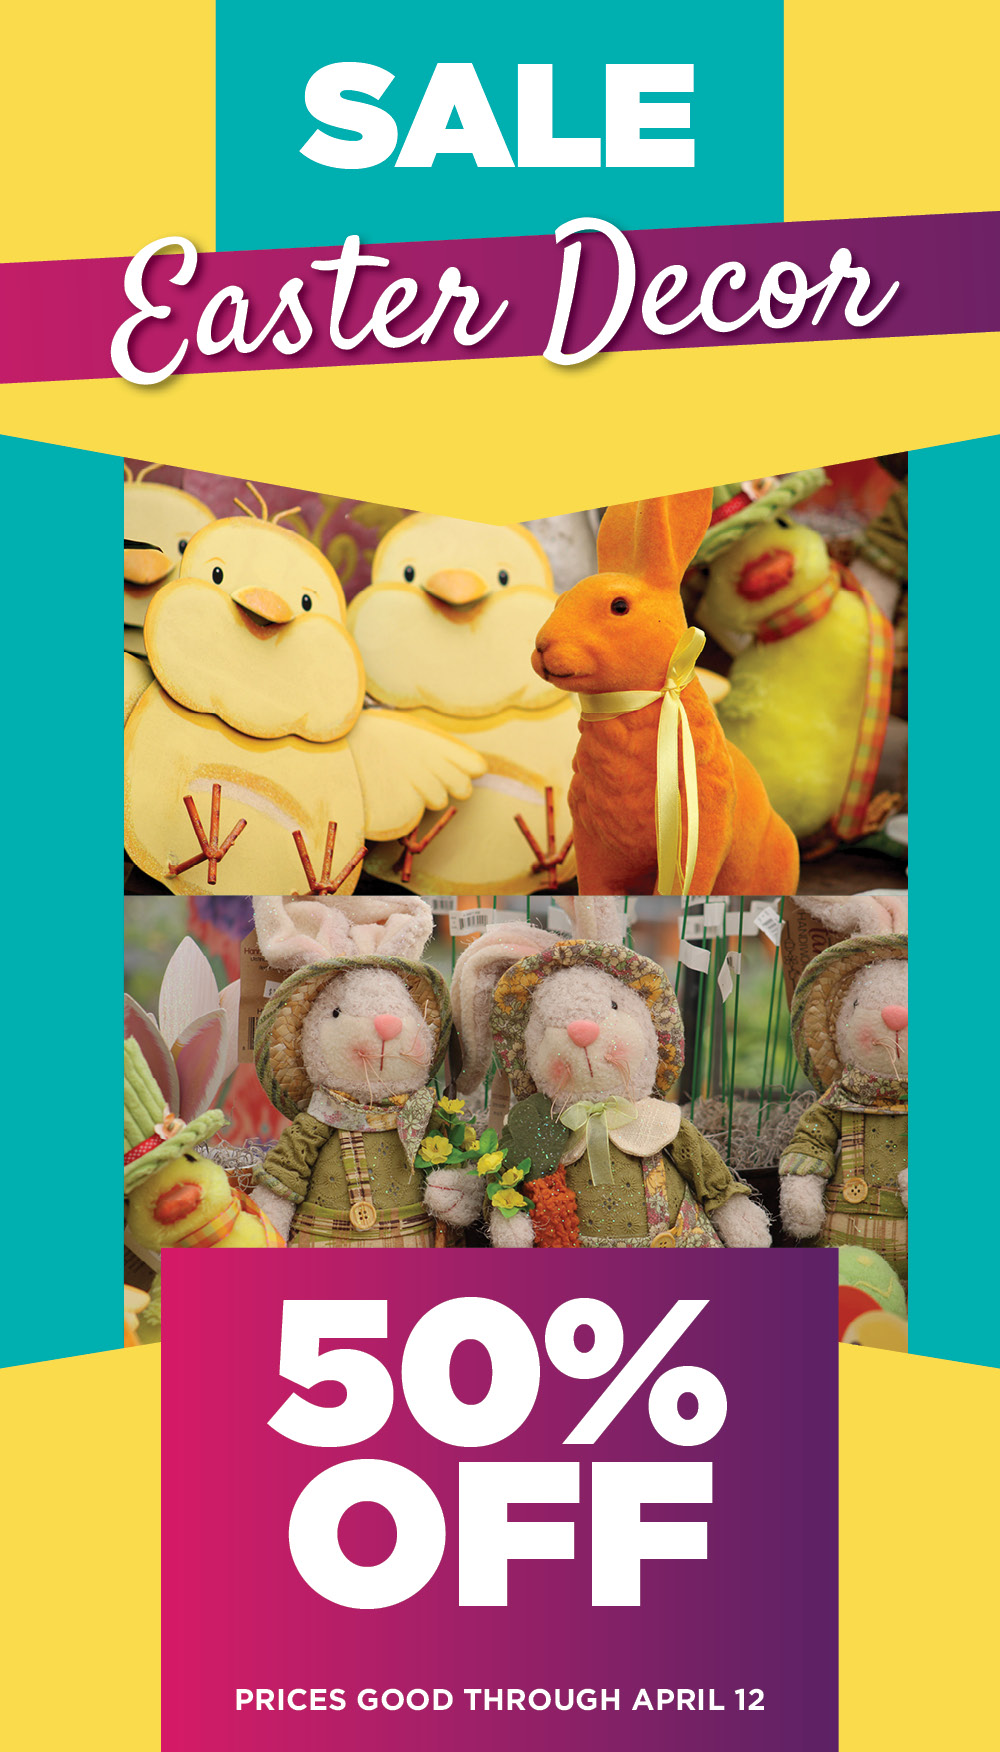 Easter Decor Sale | TLC Garden Centers